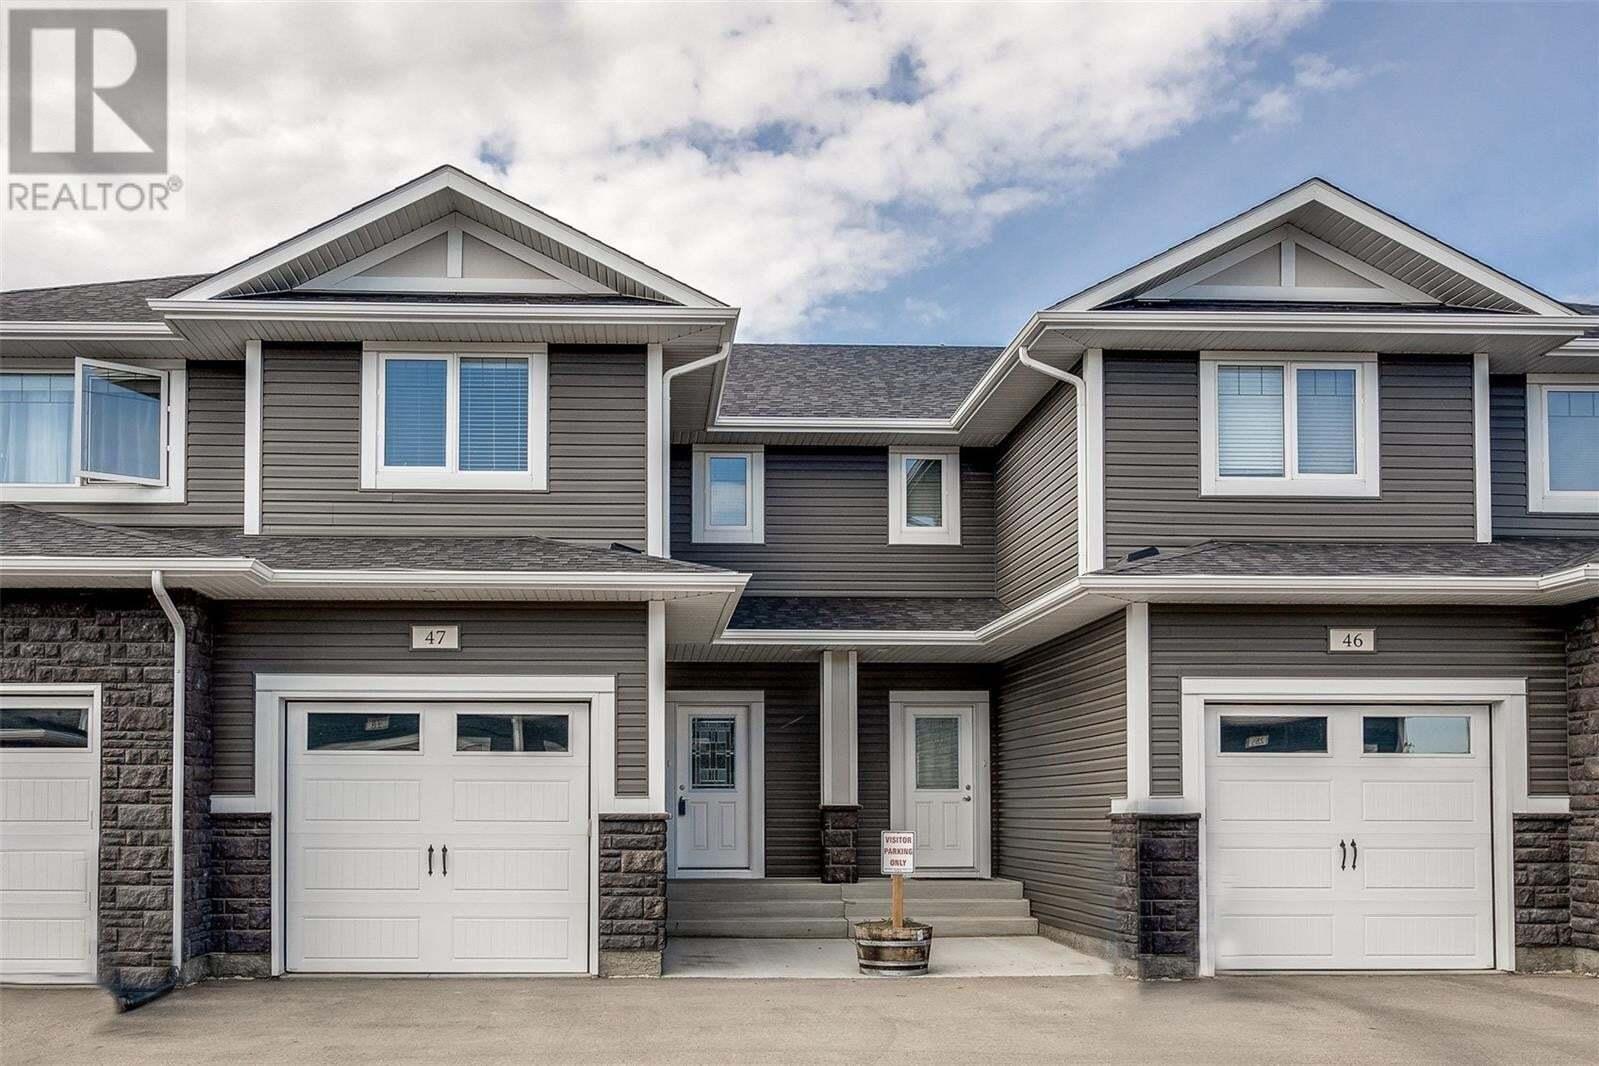 Townhouse for sale at 115 Veltkamp Cres Unit 47 Saskatoon Saskatchewan - MLS: SK827787